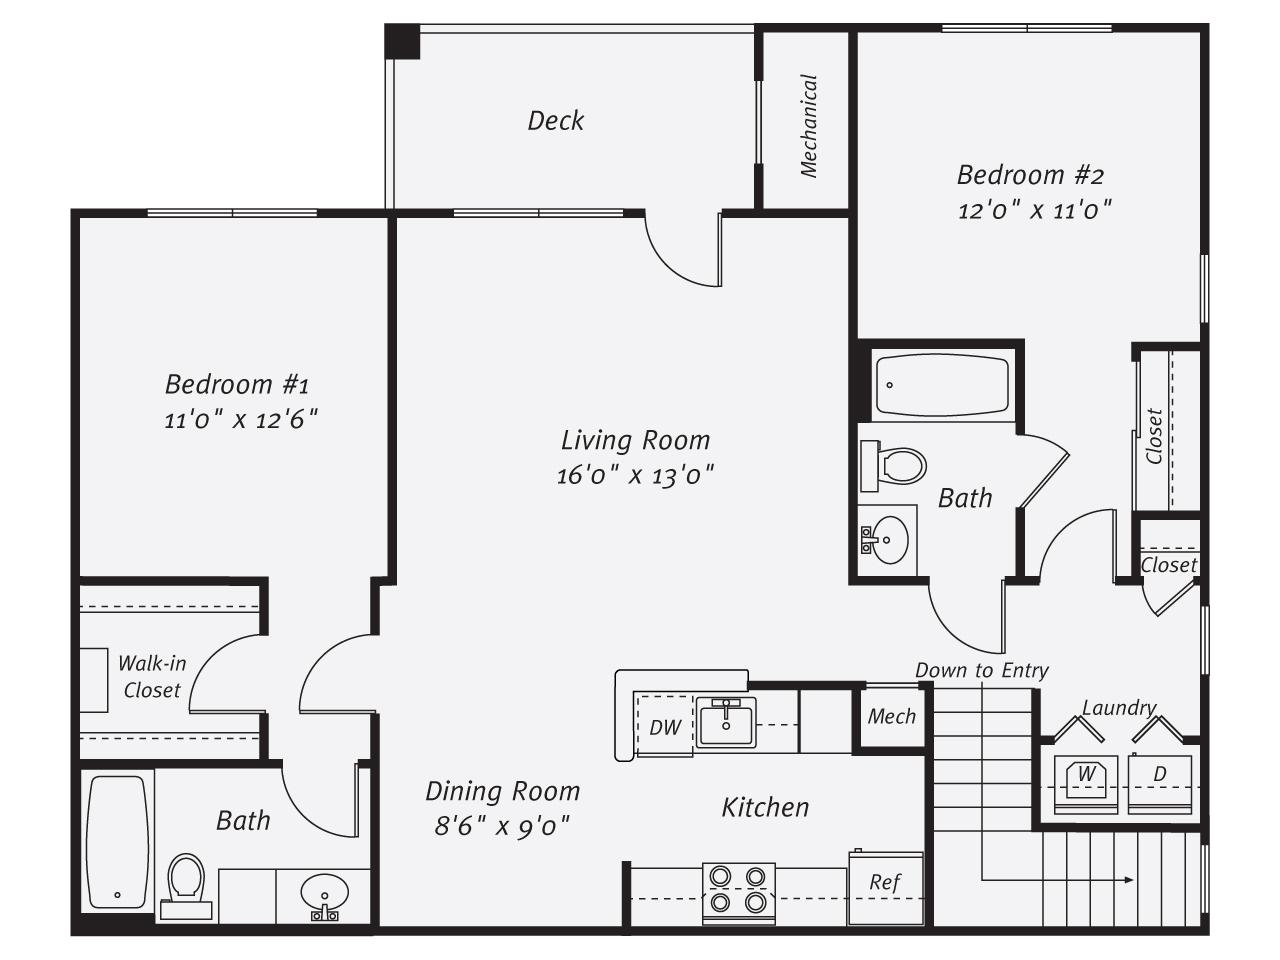 Ny coram thepointatpineridge p0571769 ny014 b4 2 floorplan